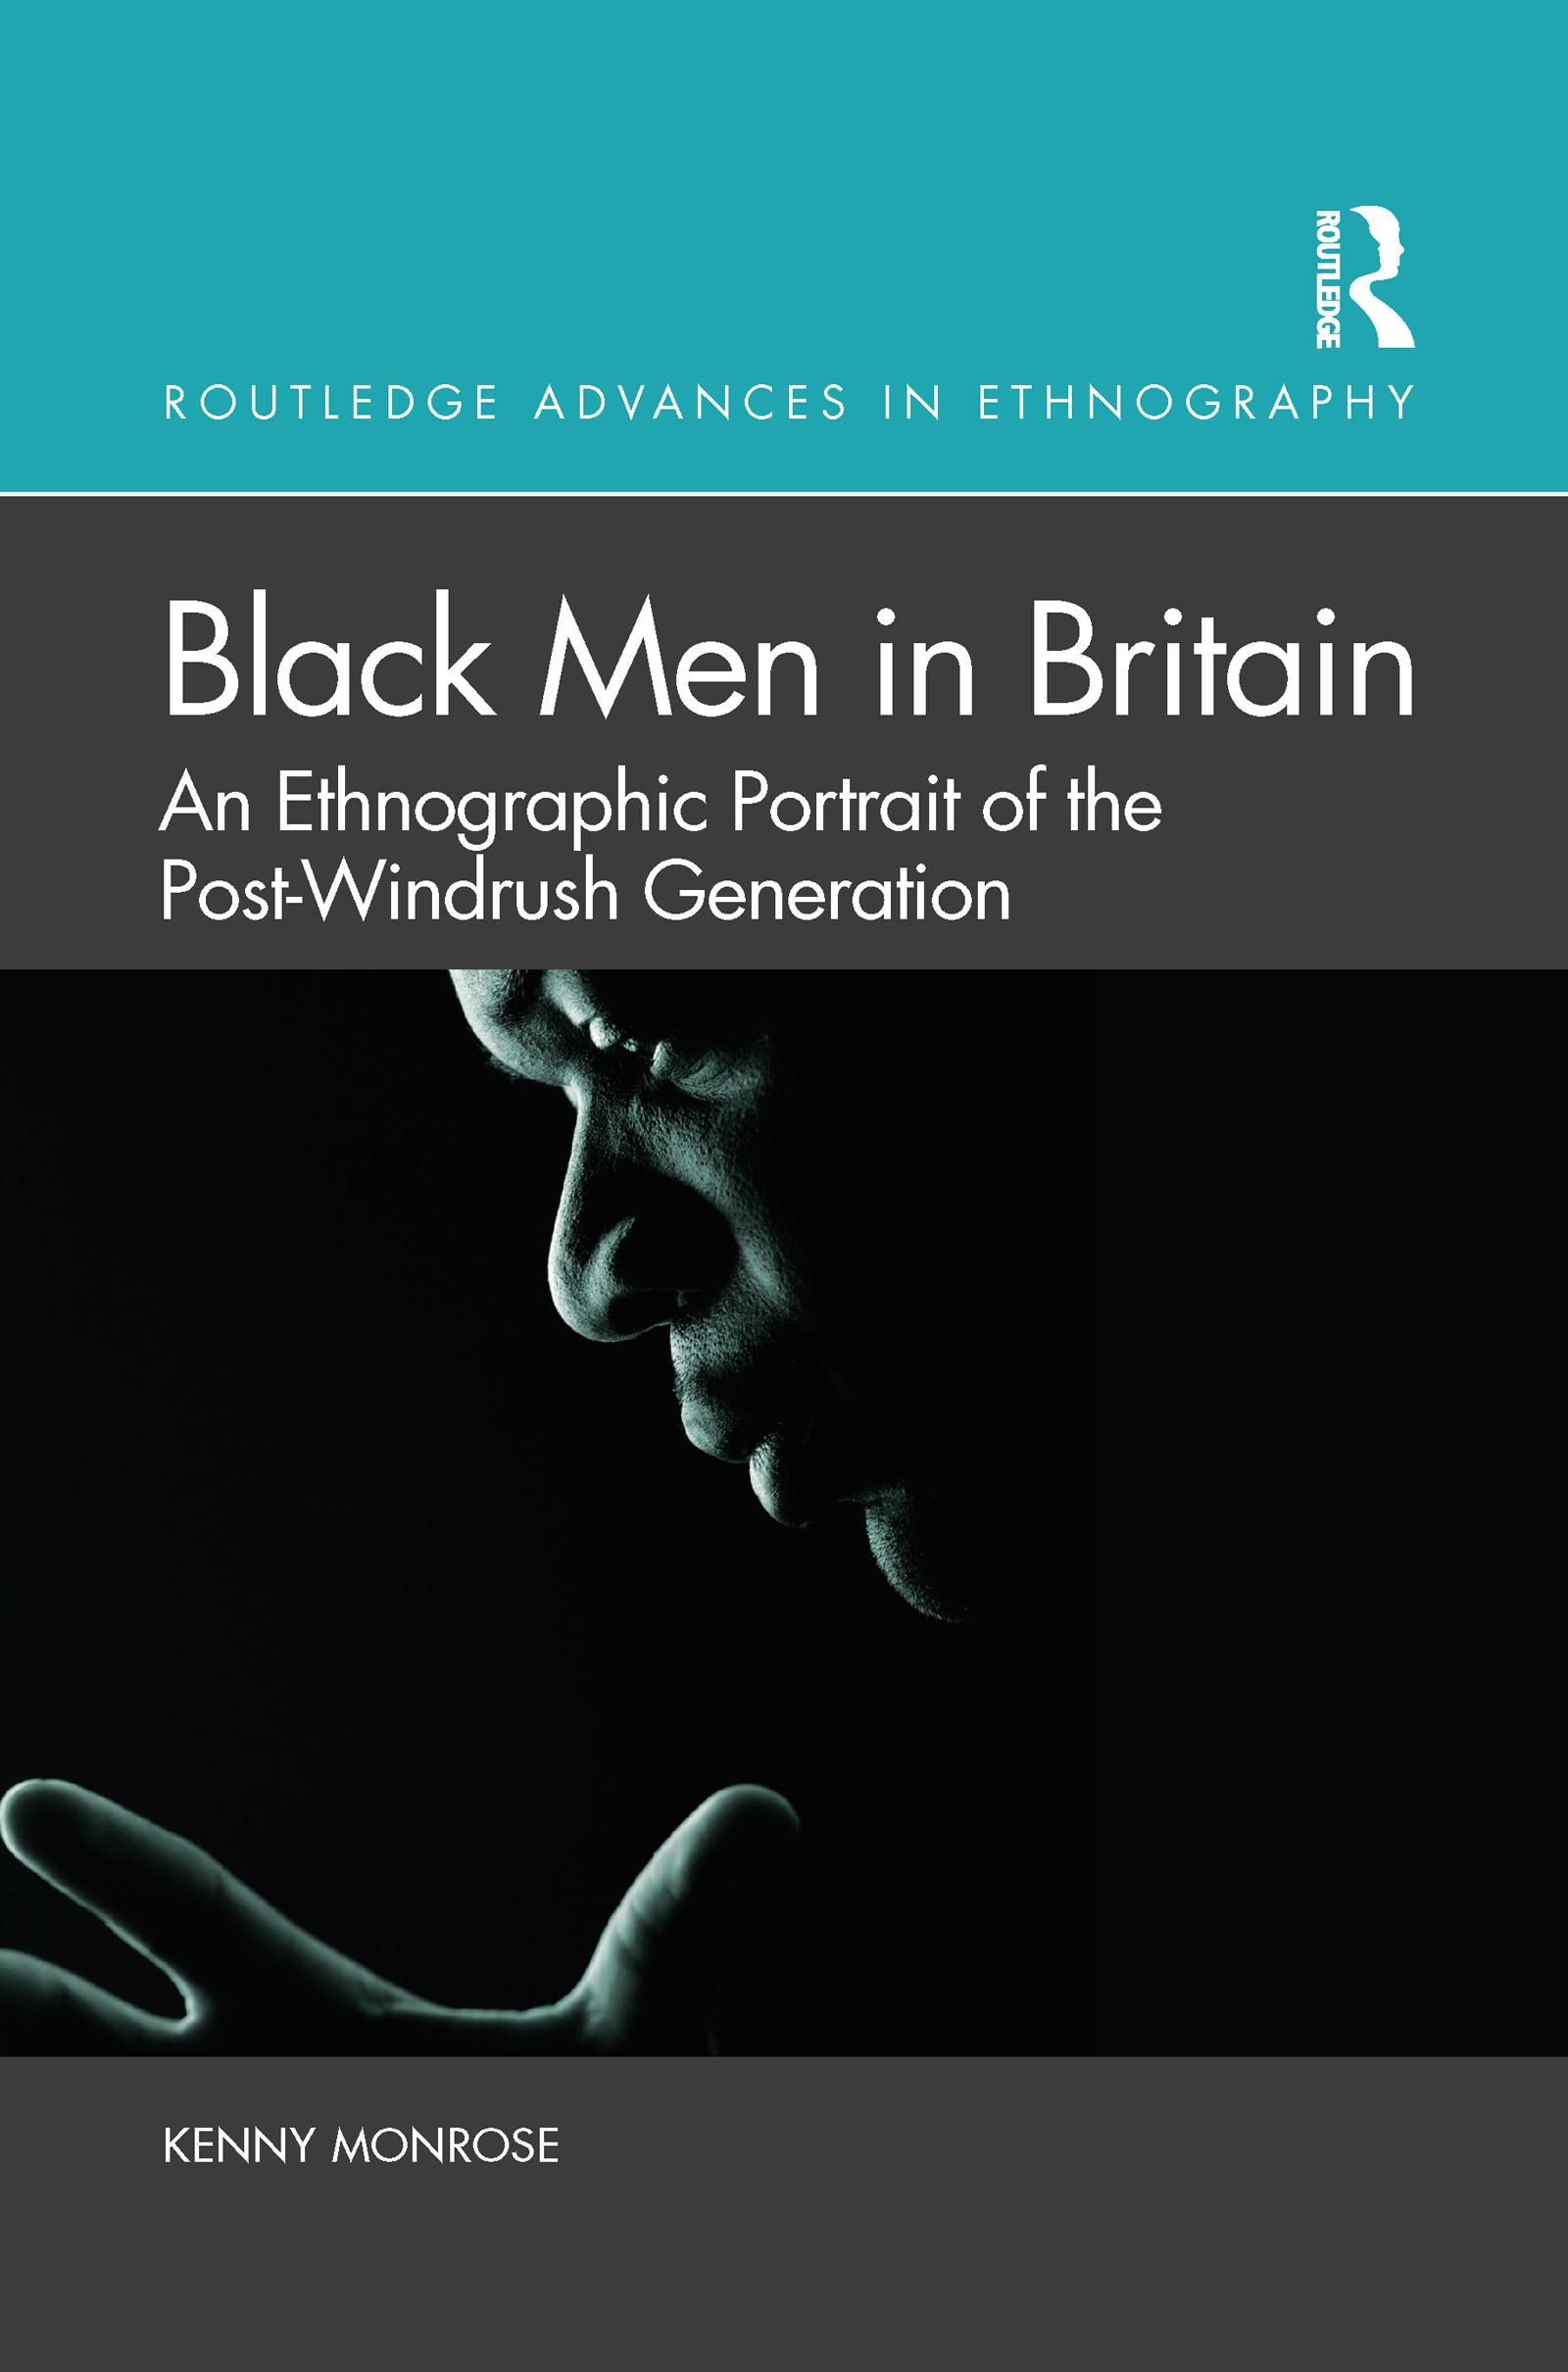 Black Men in Britain